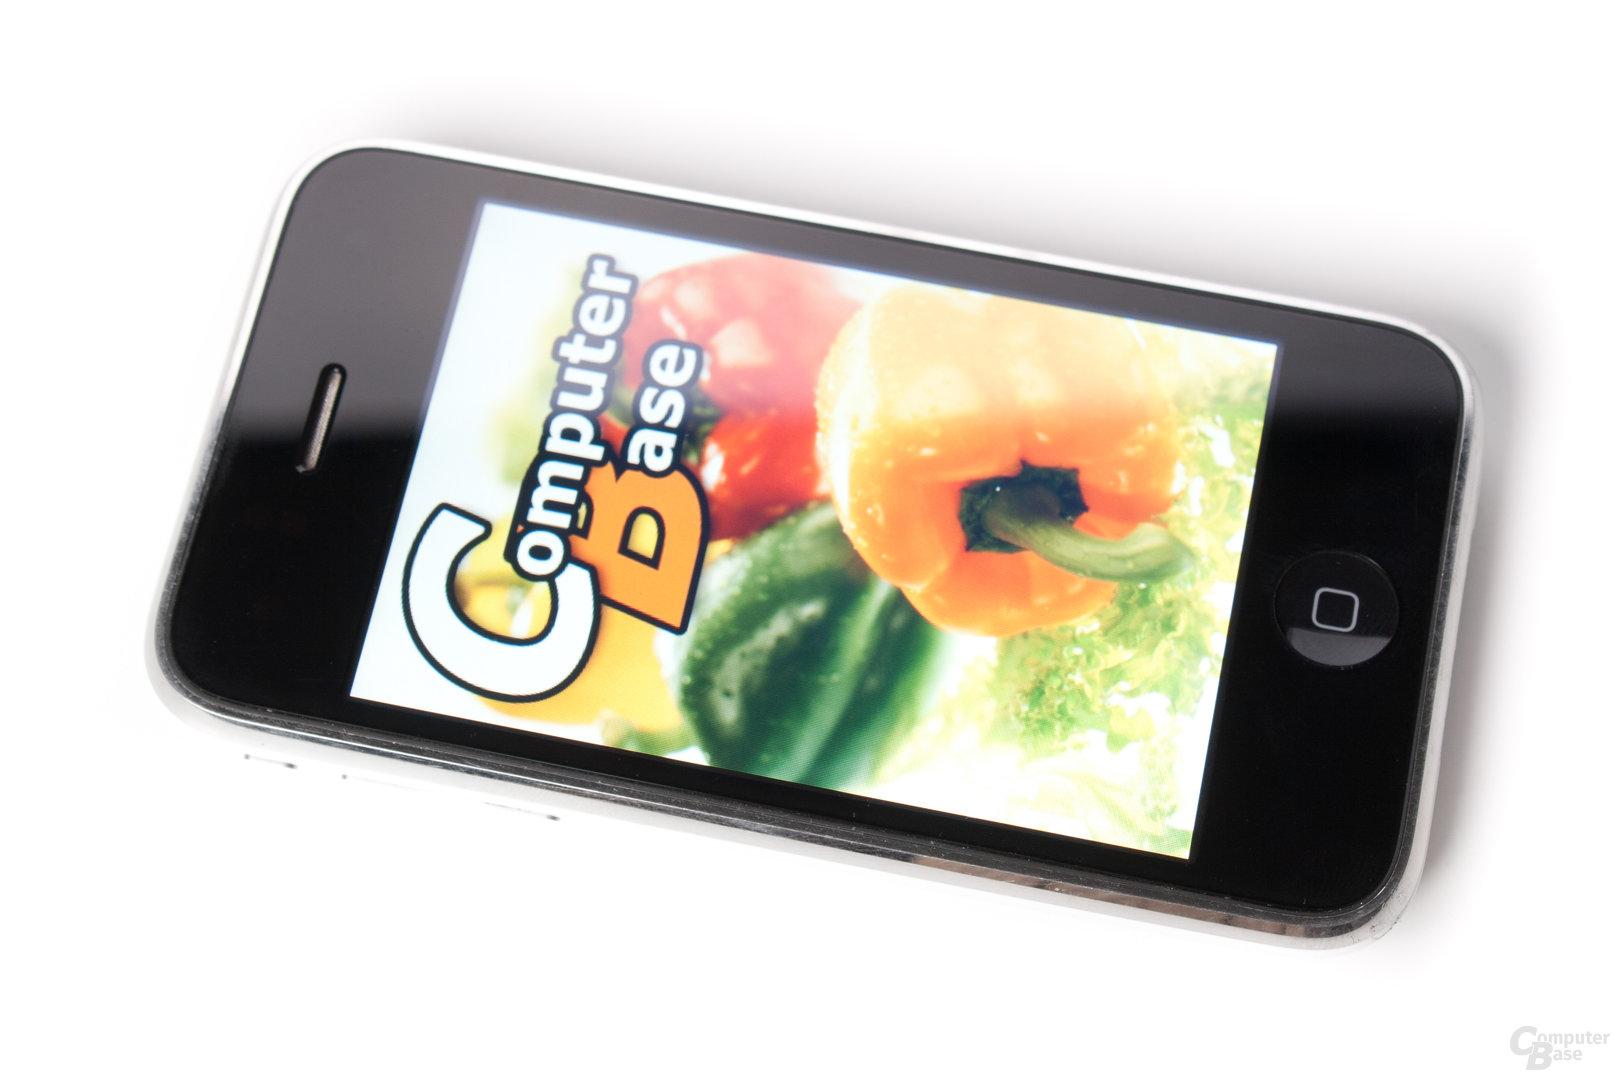 Display des iPhone 3GS